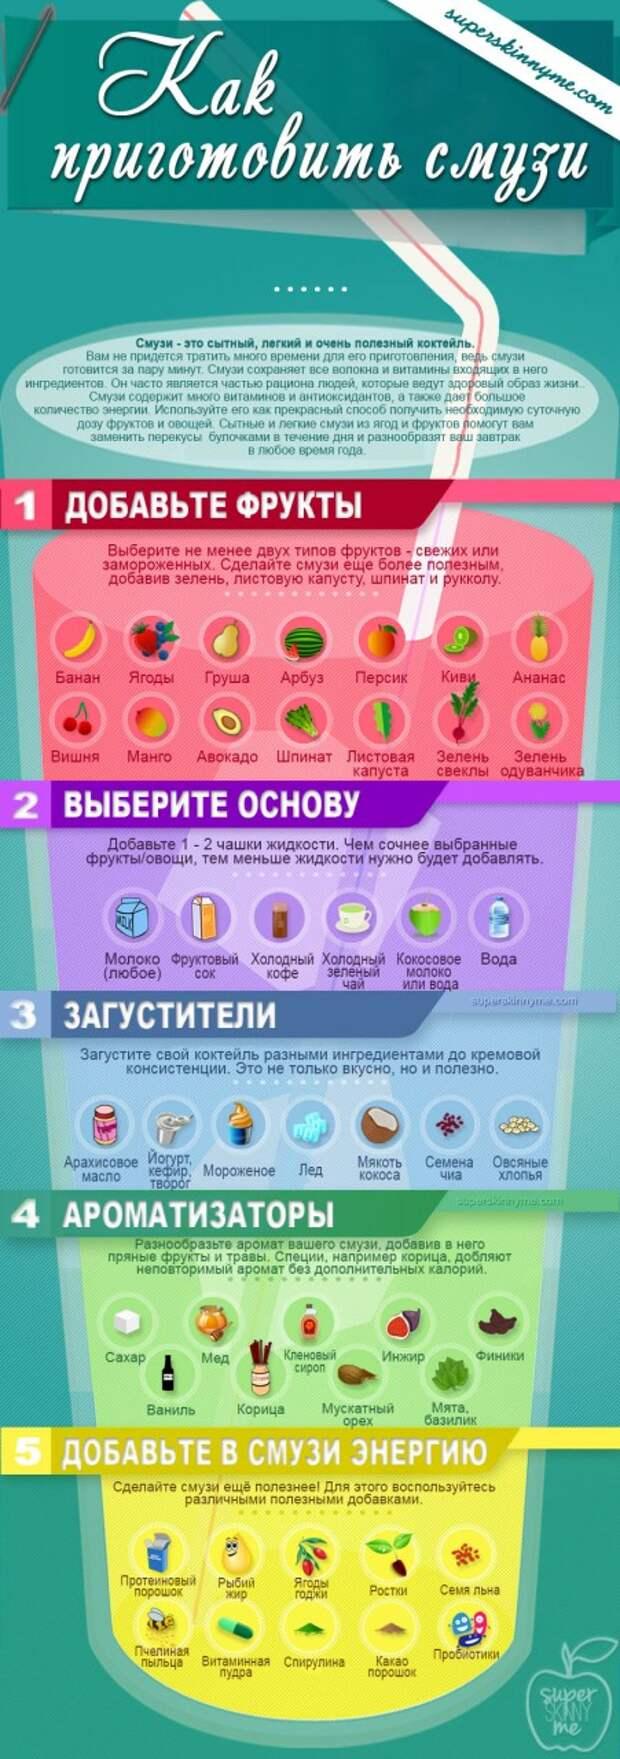 http://lifehacker.ru/wp-content/uploads/2014/02/16120300-how-to-make-a-smoothie.jpg